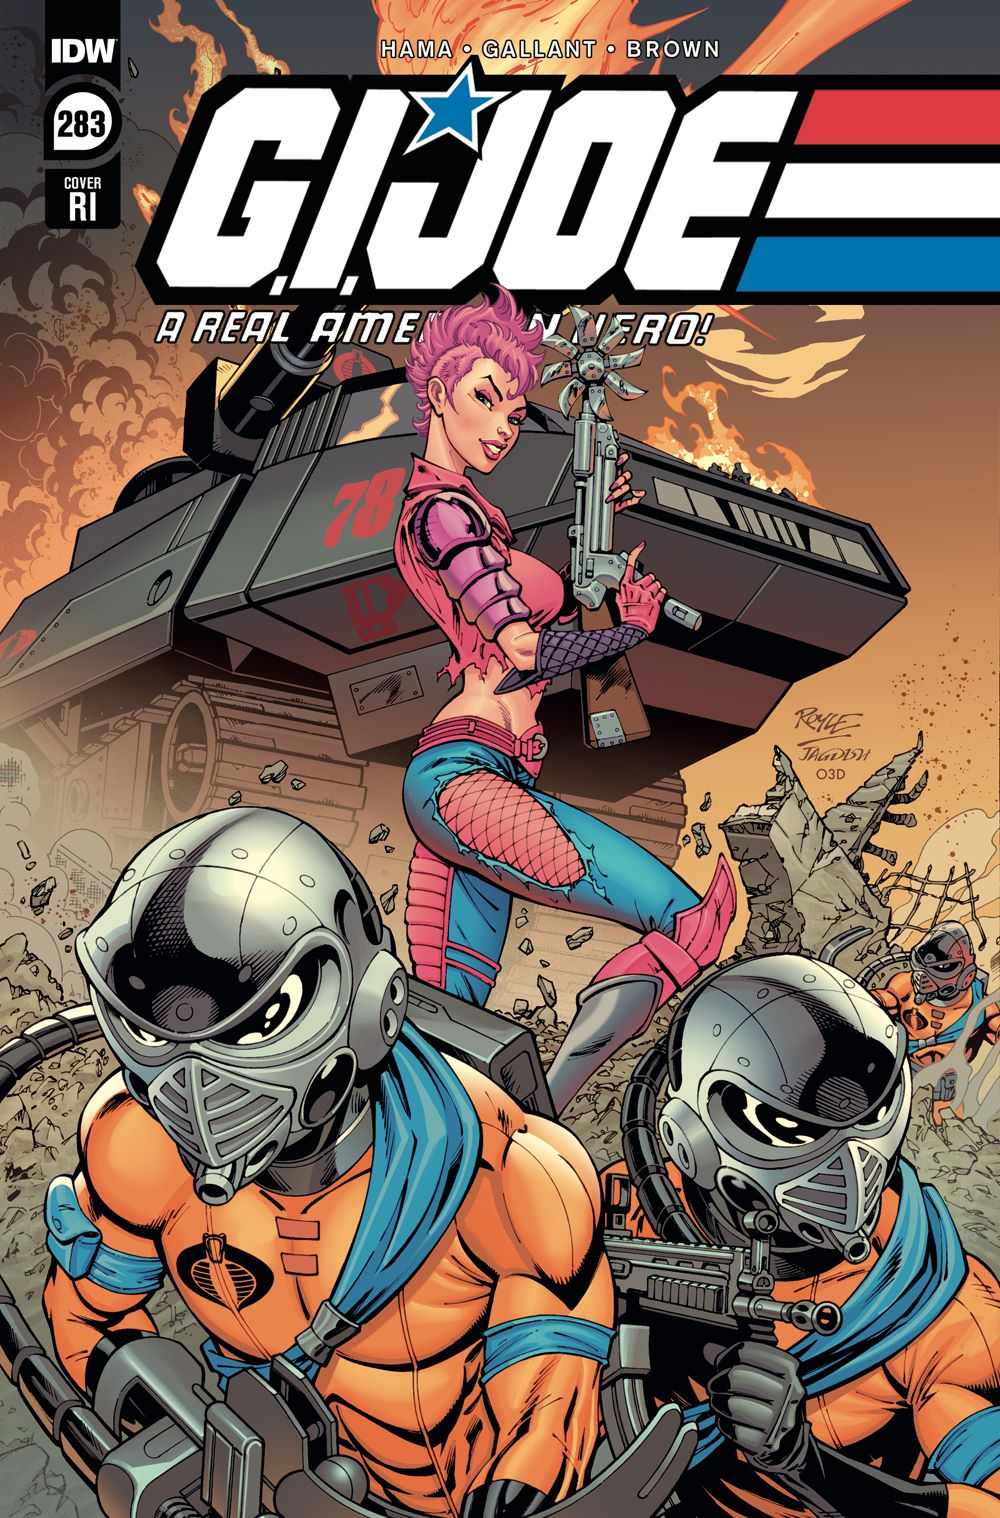 GIJoeRAH283-coverRI ComicList Previews: G.I. JOE A REAL AMERICAN HERO #283